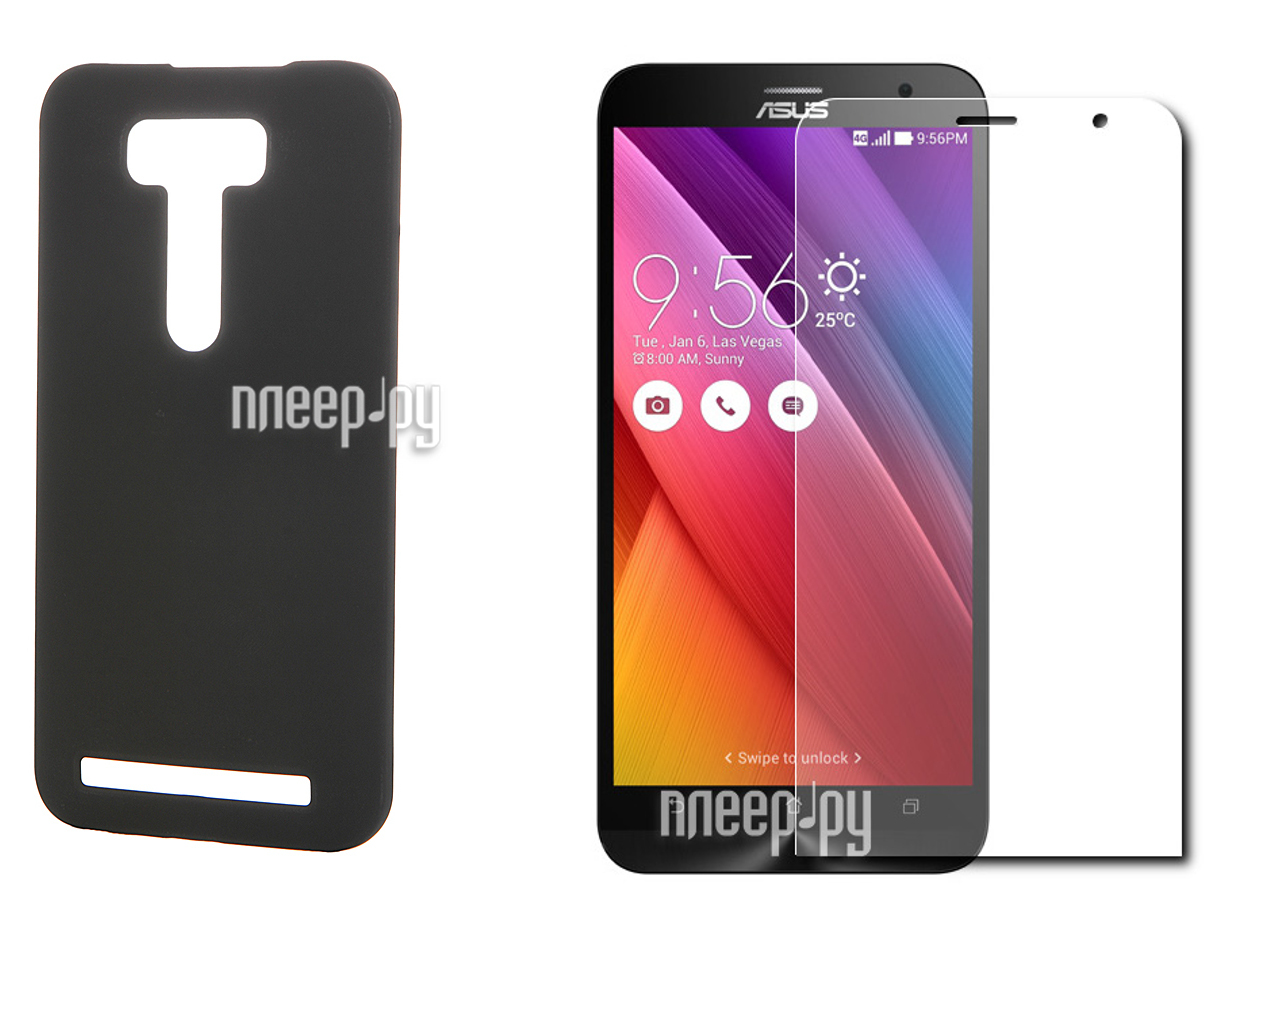 Аксессуар Чехол-накладка Samsung Galaxy A3 2016 Deppa Air Case + защитная пленка Black 83223